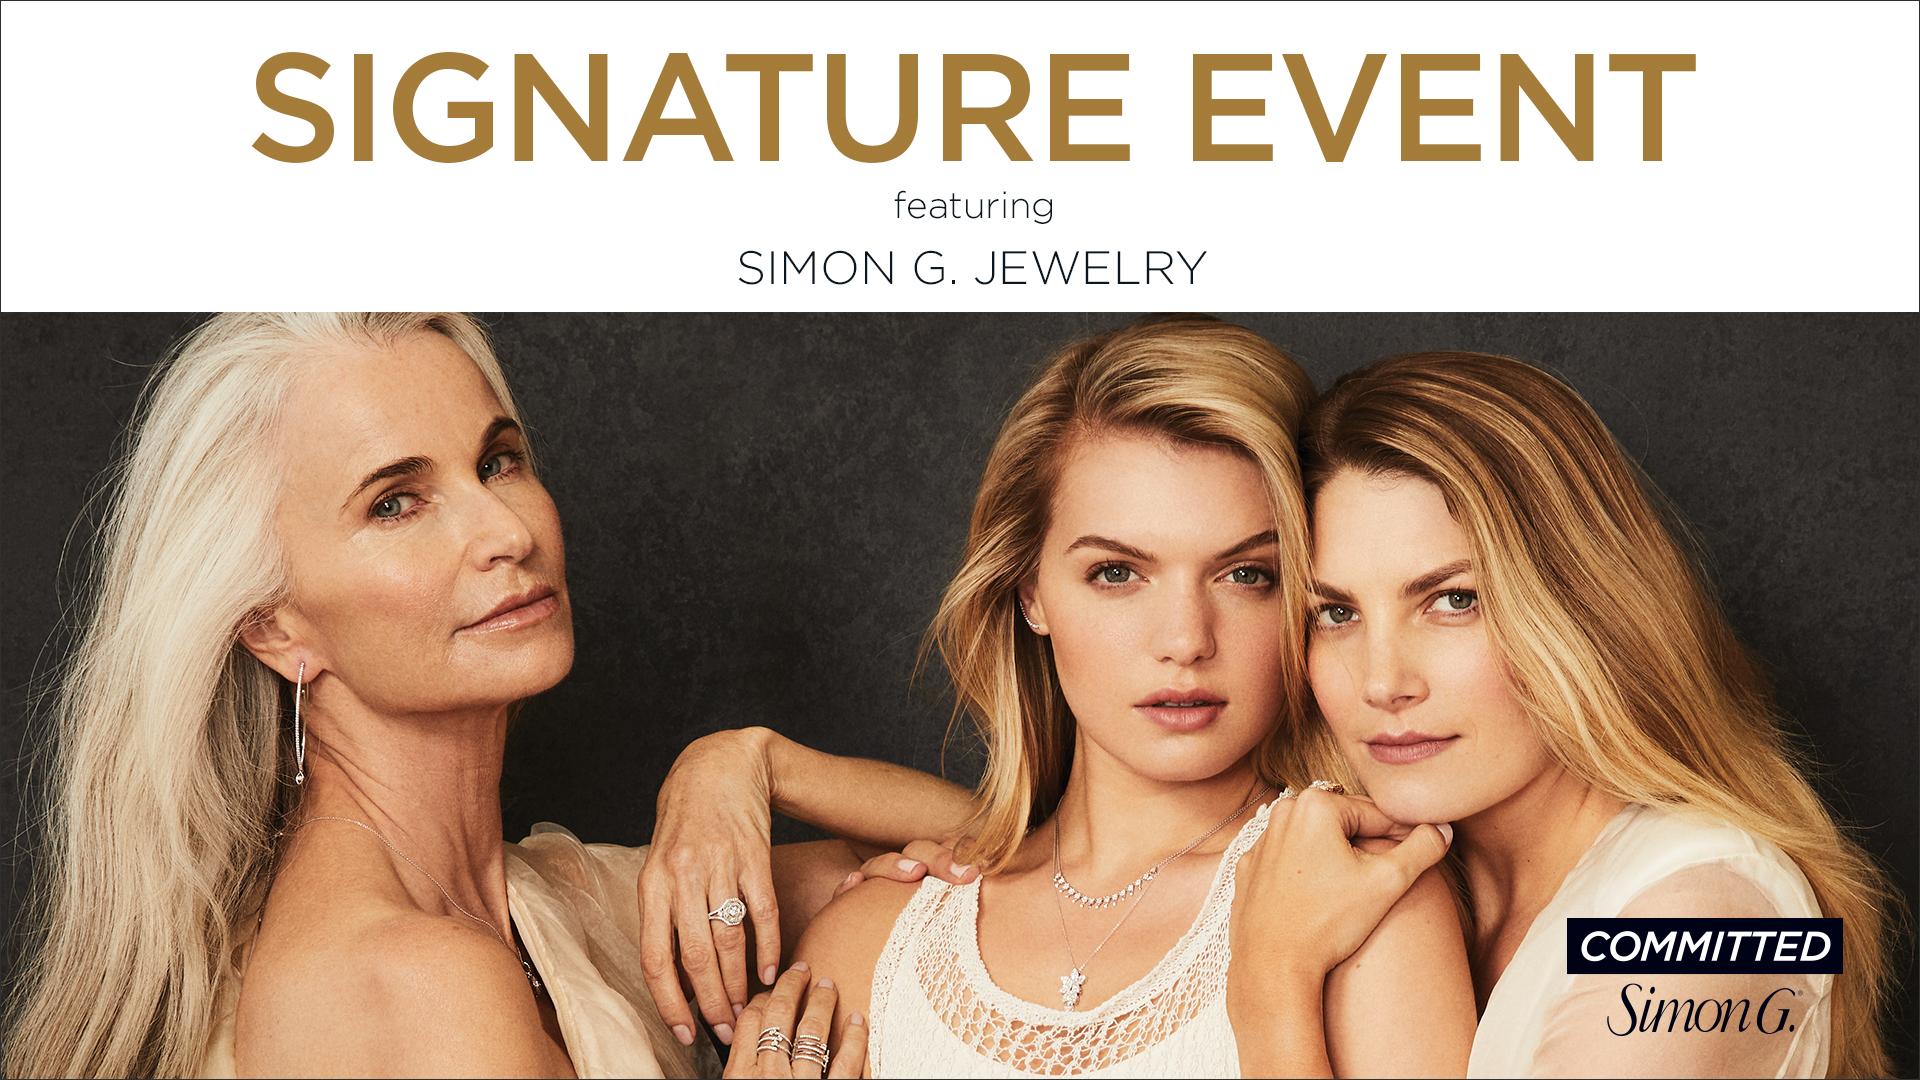 Signature Event at Bella Cosa Jewelers